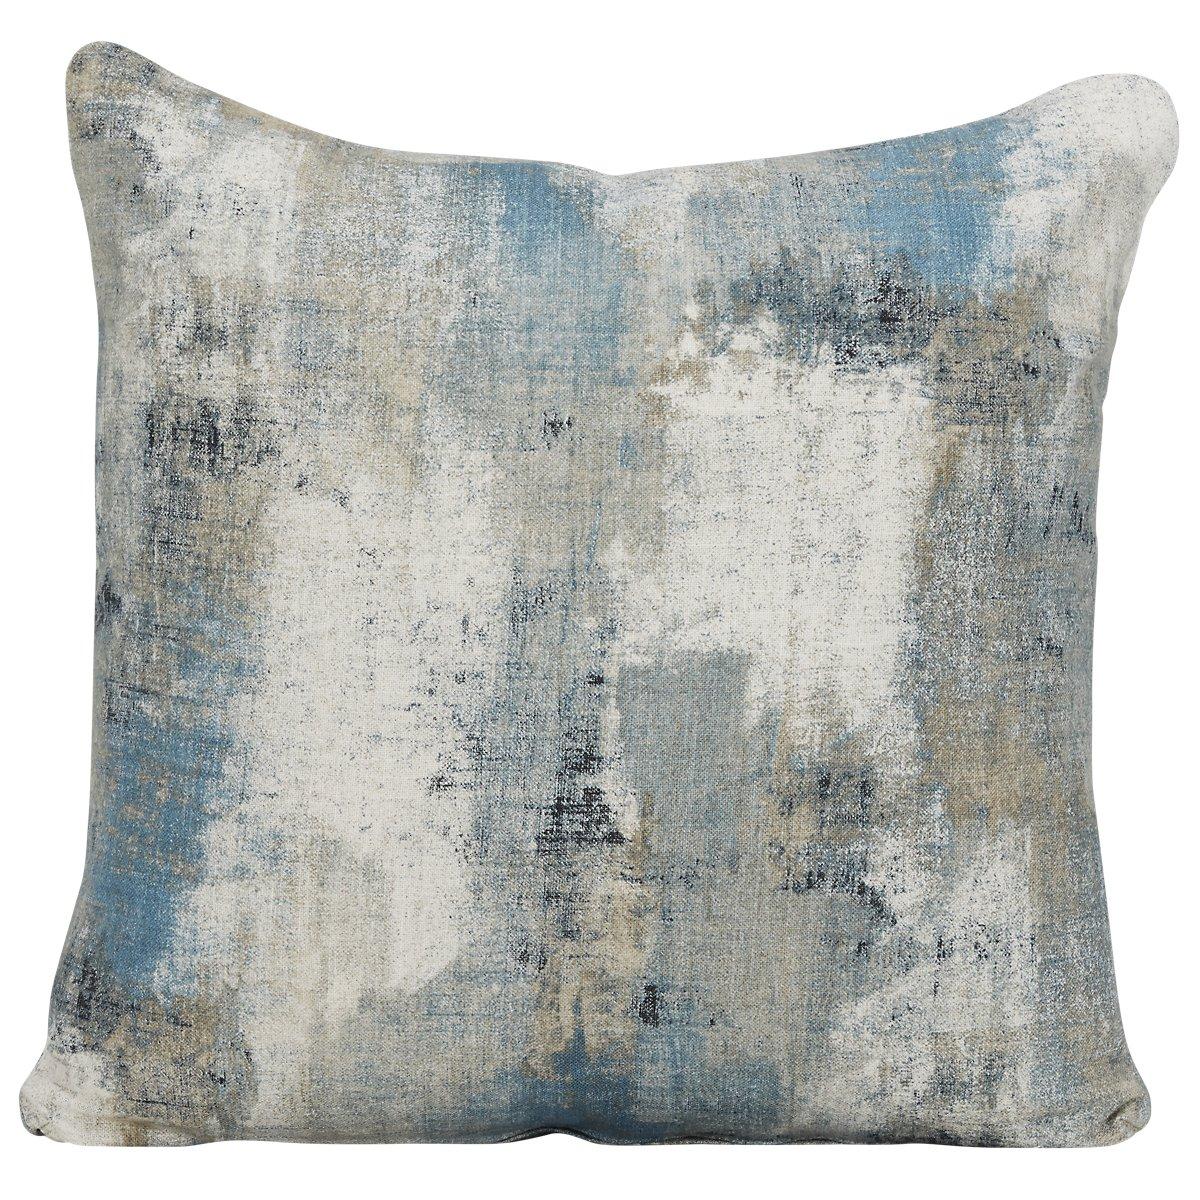 Antalya Dark Blue Fabric Square Accent Pillow